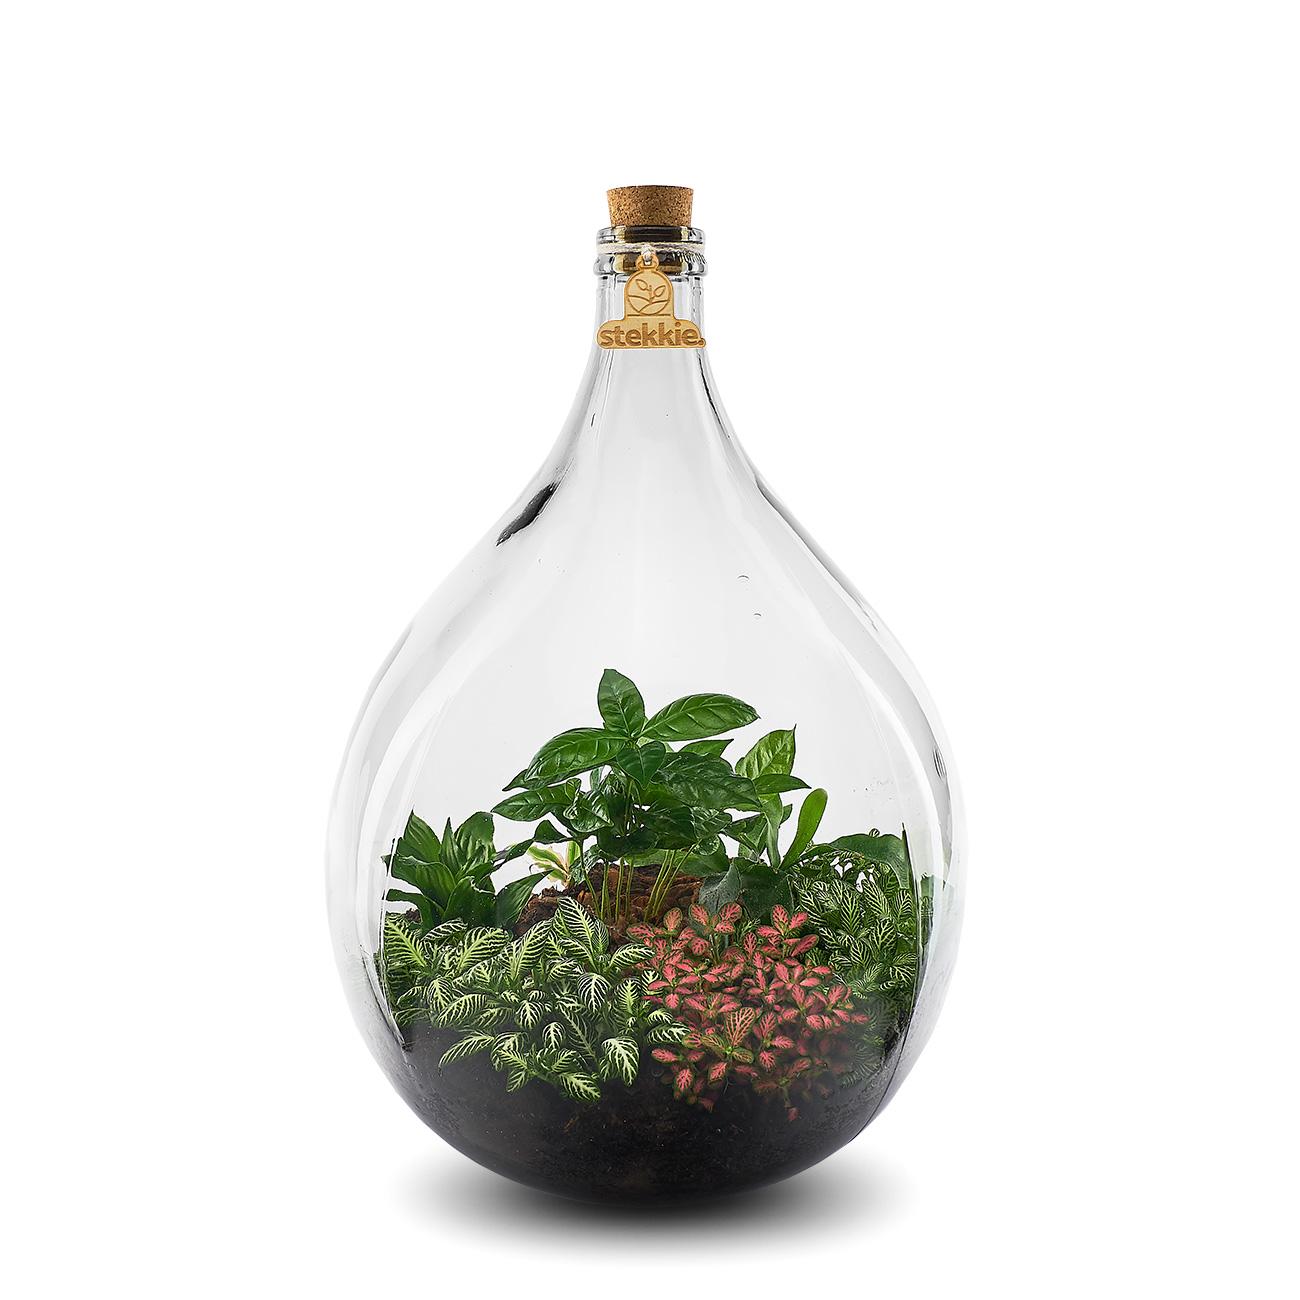 Stekkie Large roze mini-ecosysteem met coffea plant